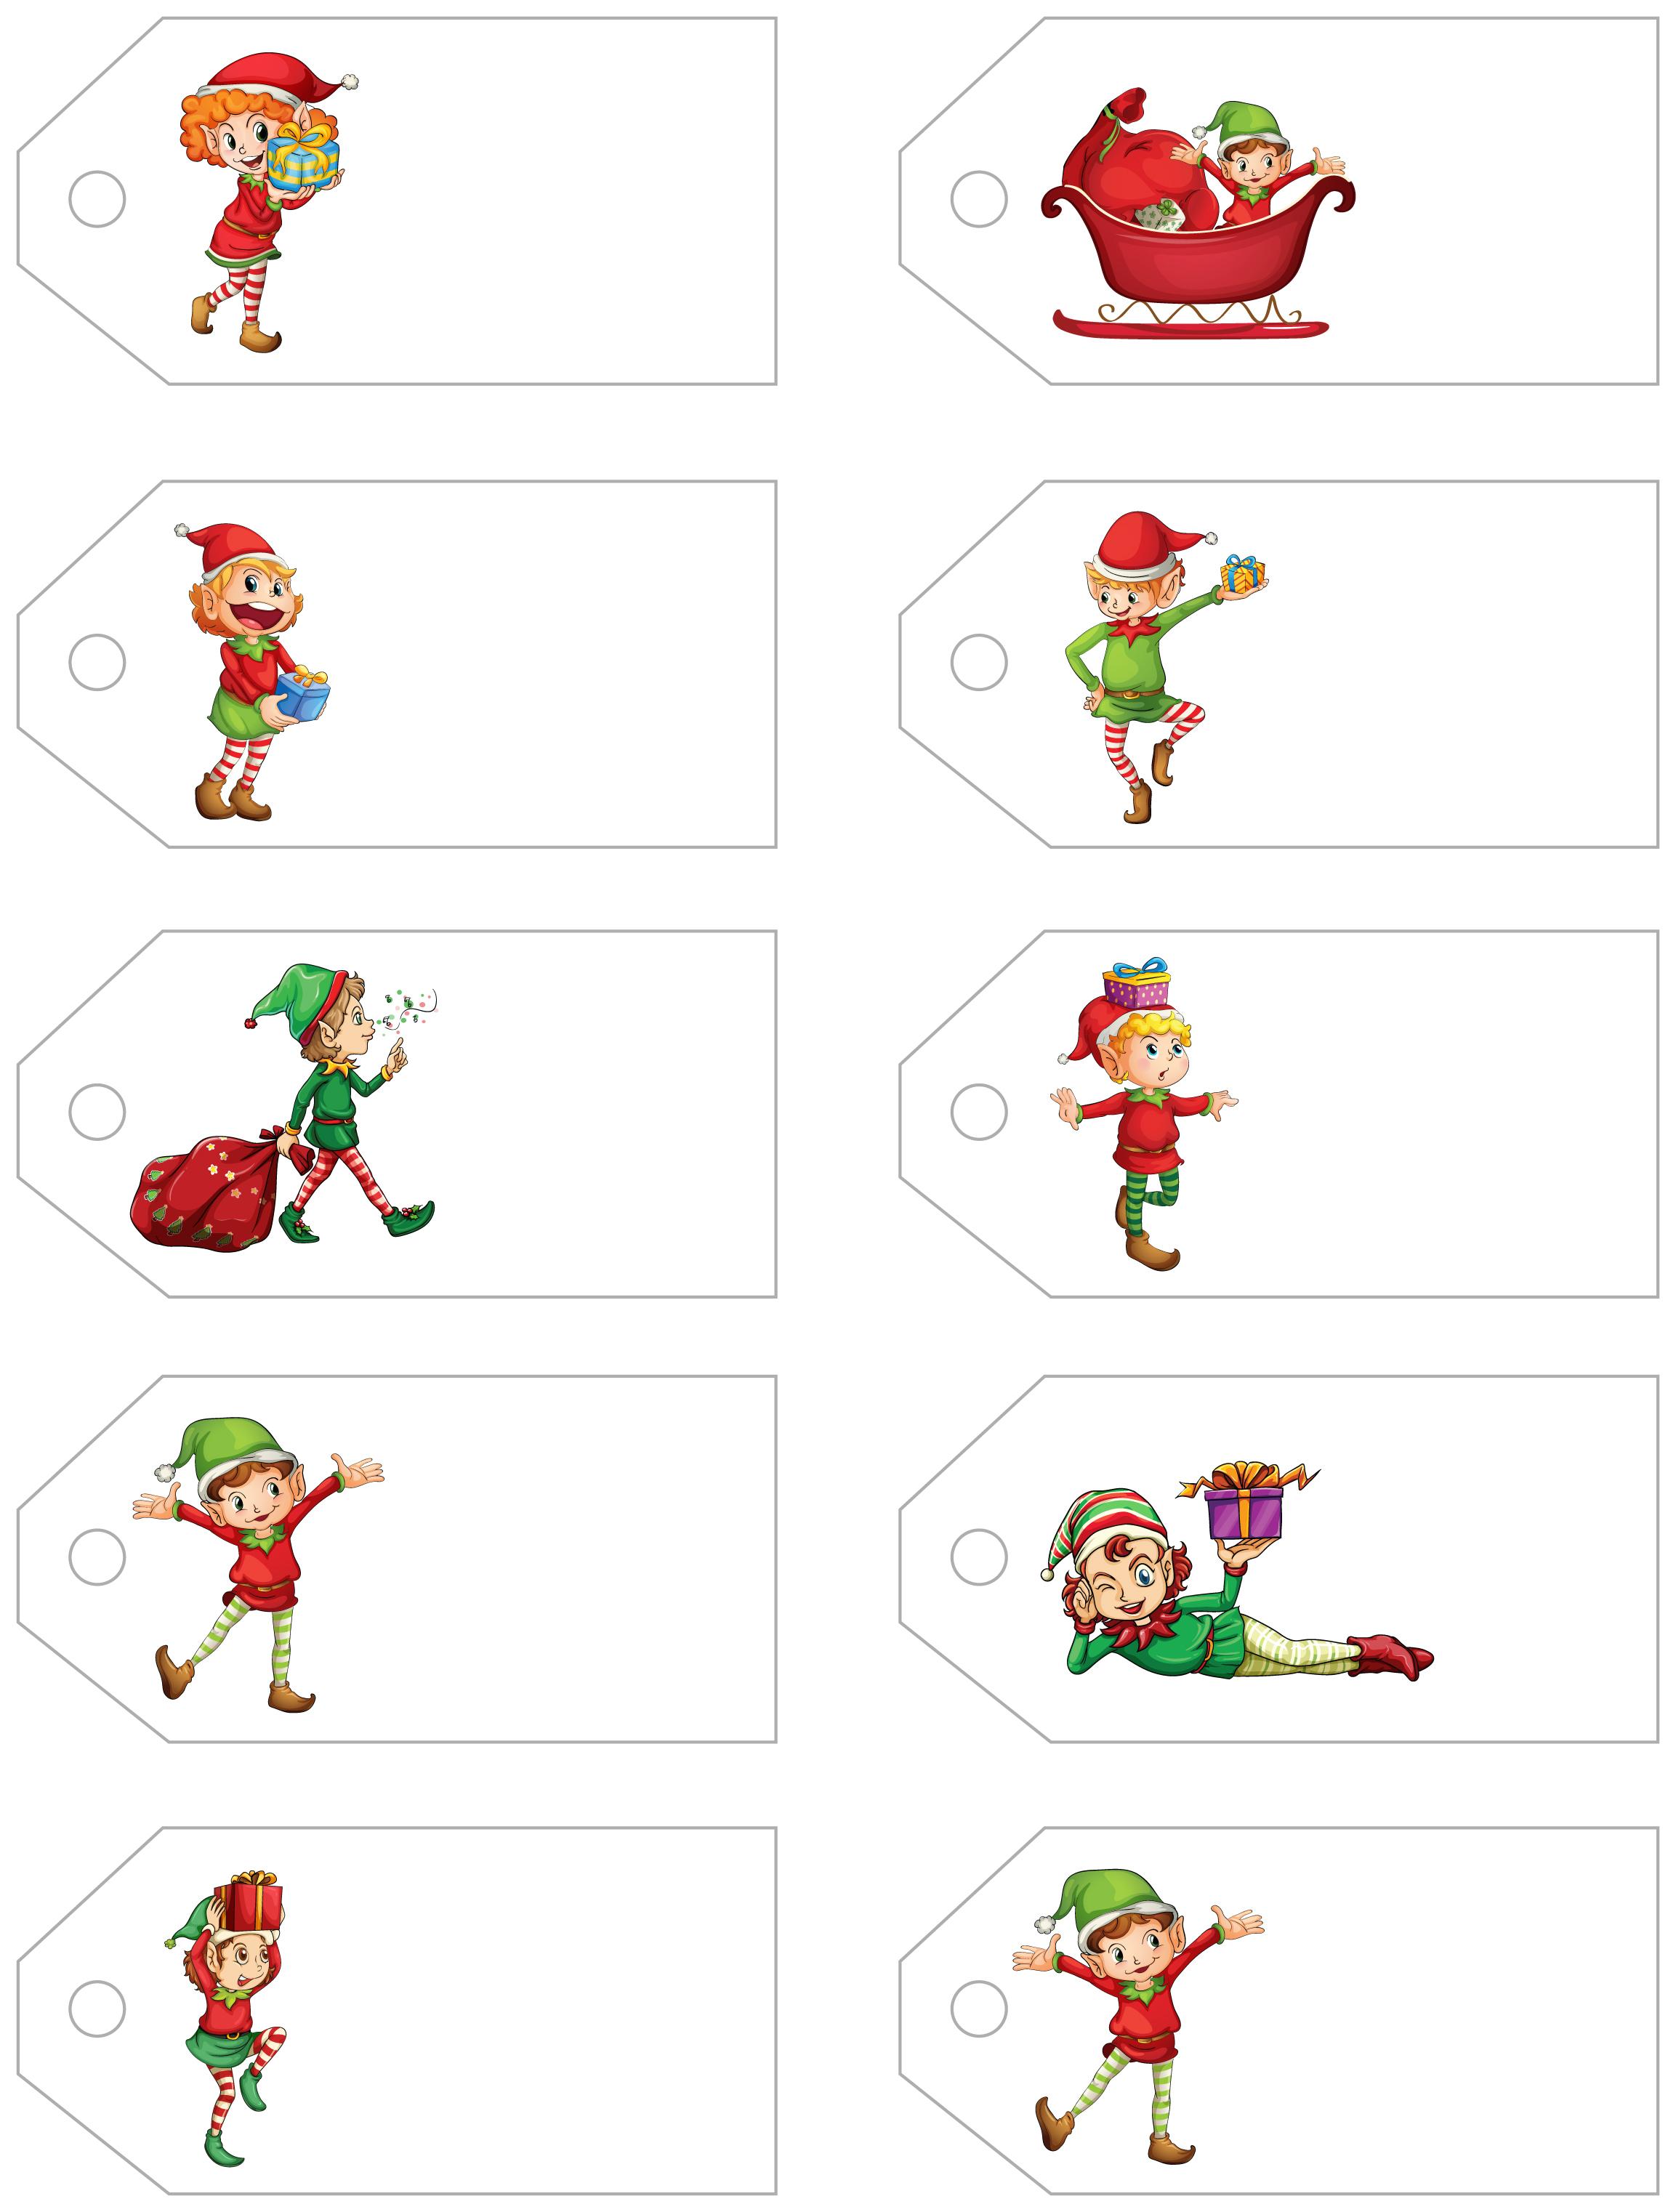 Santa's Little Gift To You! Free Printable Gift Tags And Labels - Free Printable Christmas Labels